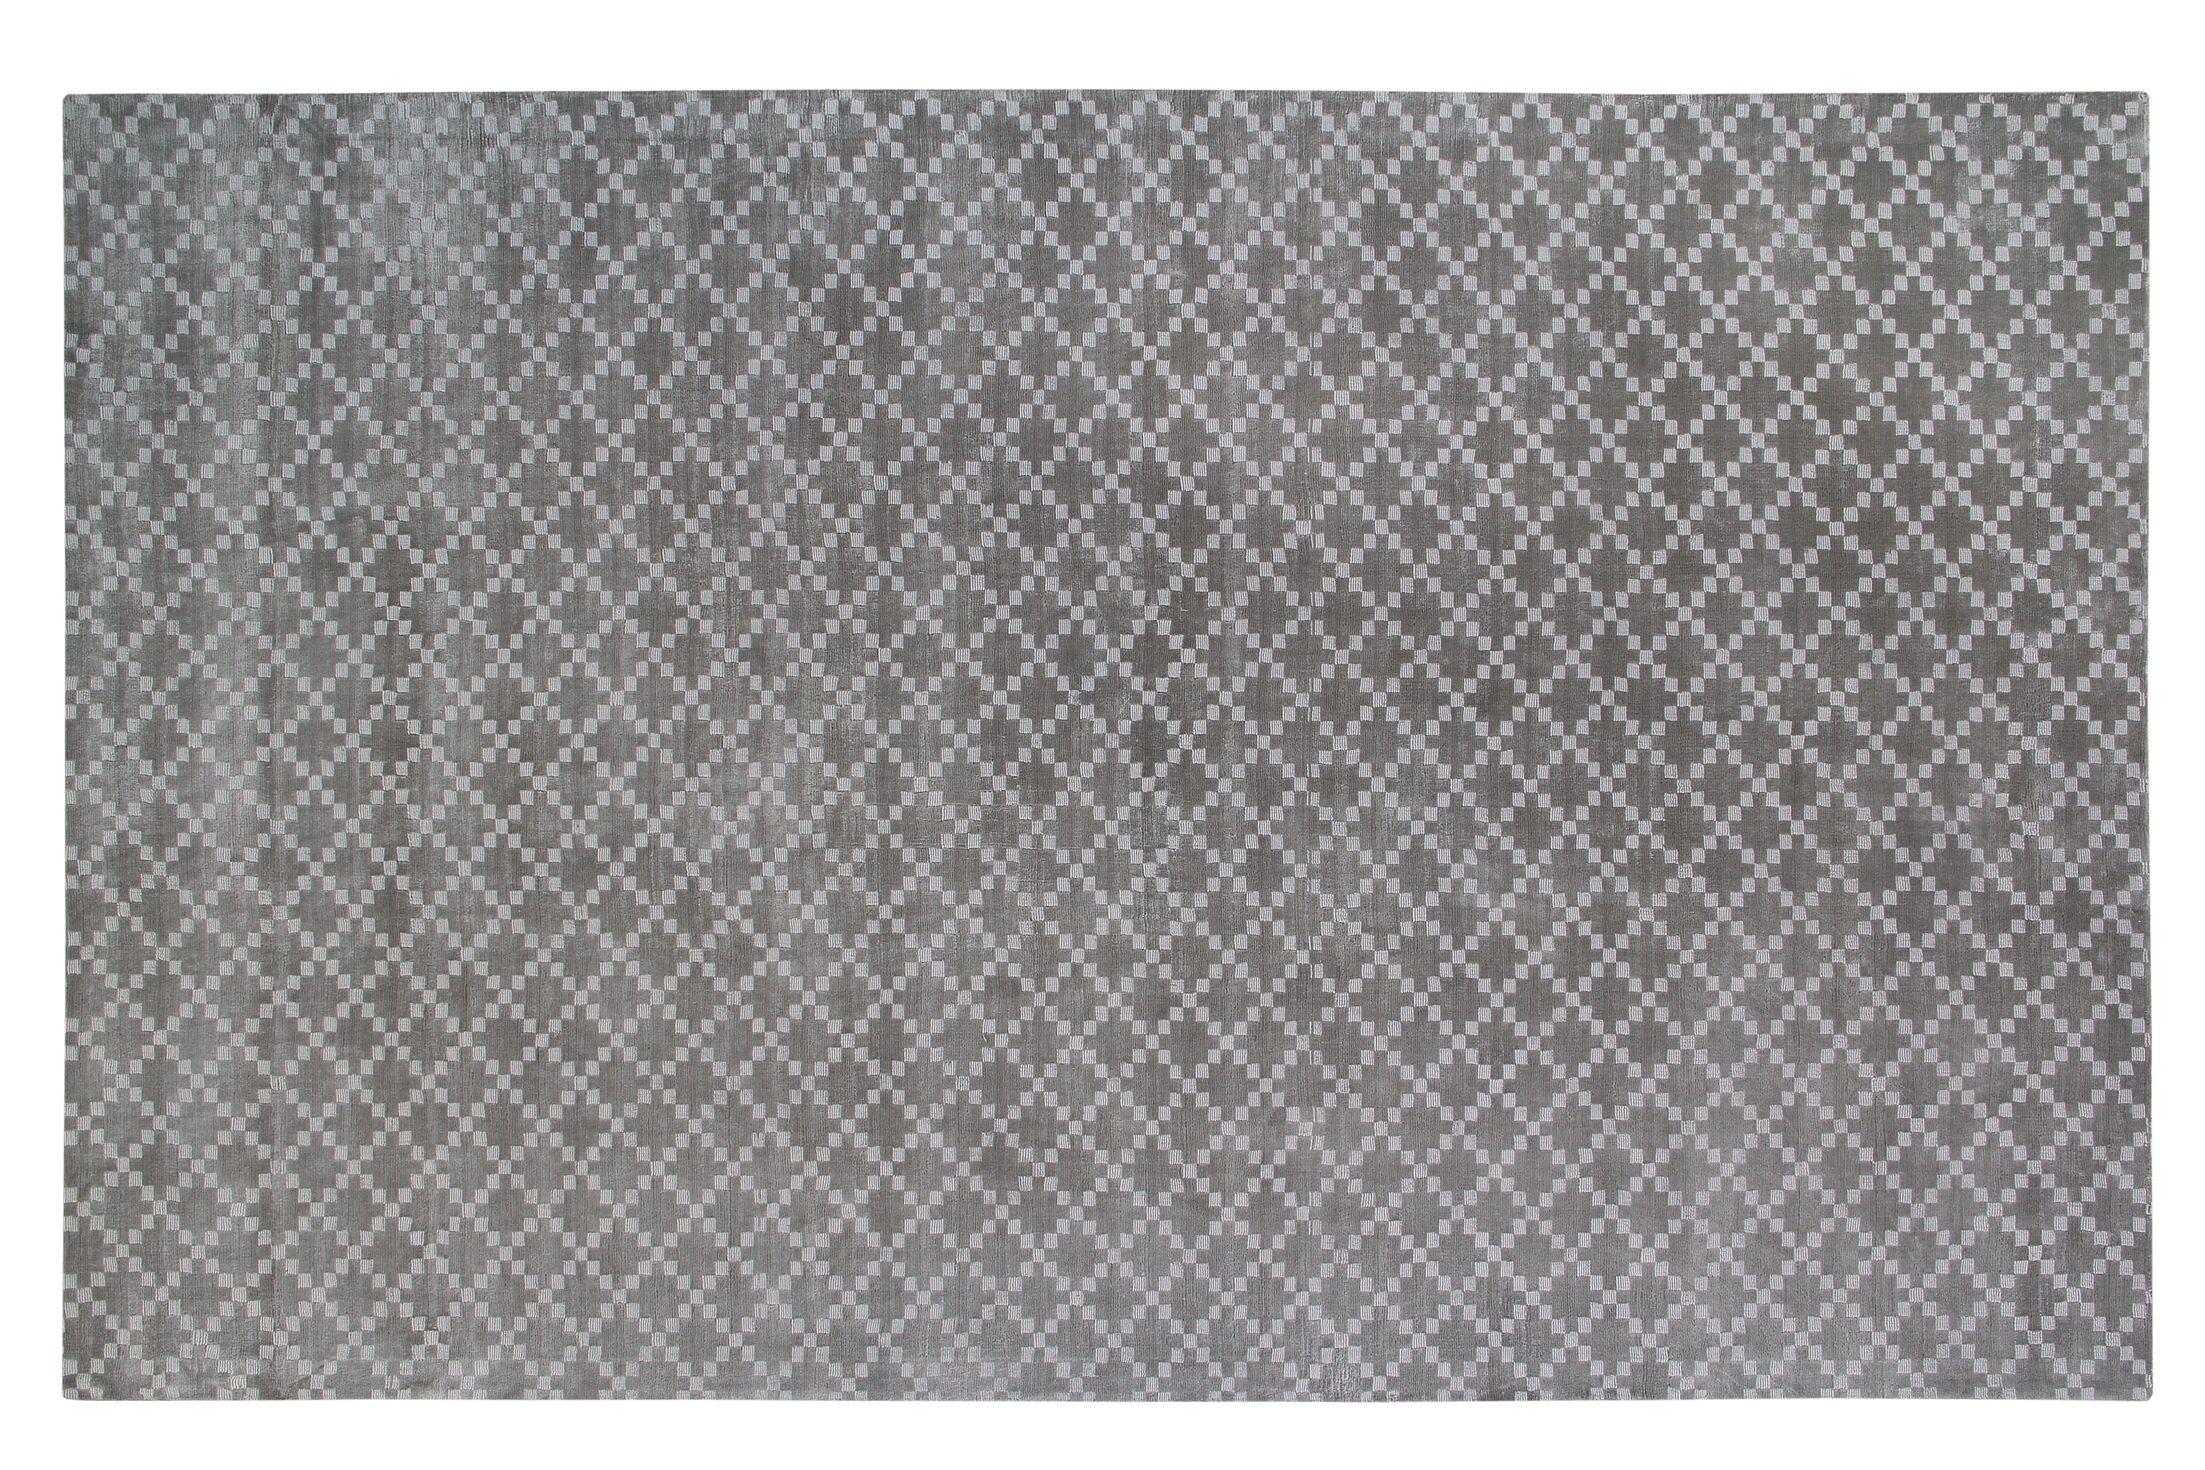 Teressa Diamond Hand-Woven Wool Gray Area Rug Rug Size: Rectangle 5'x 8'